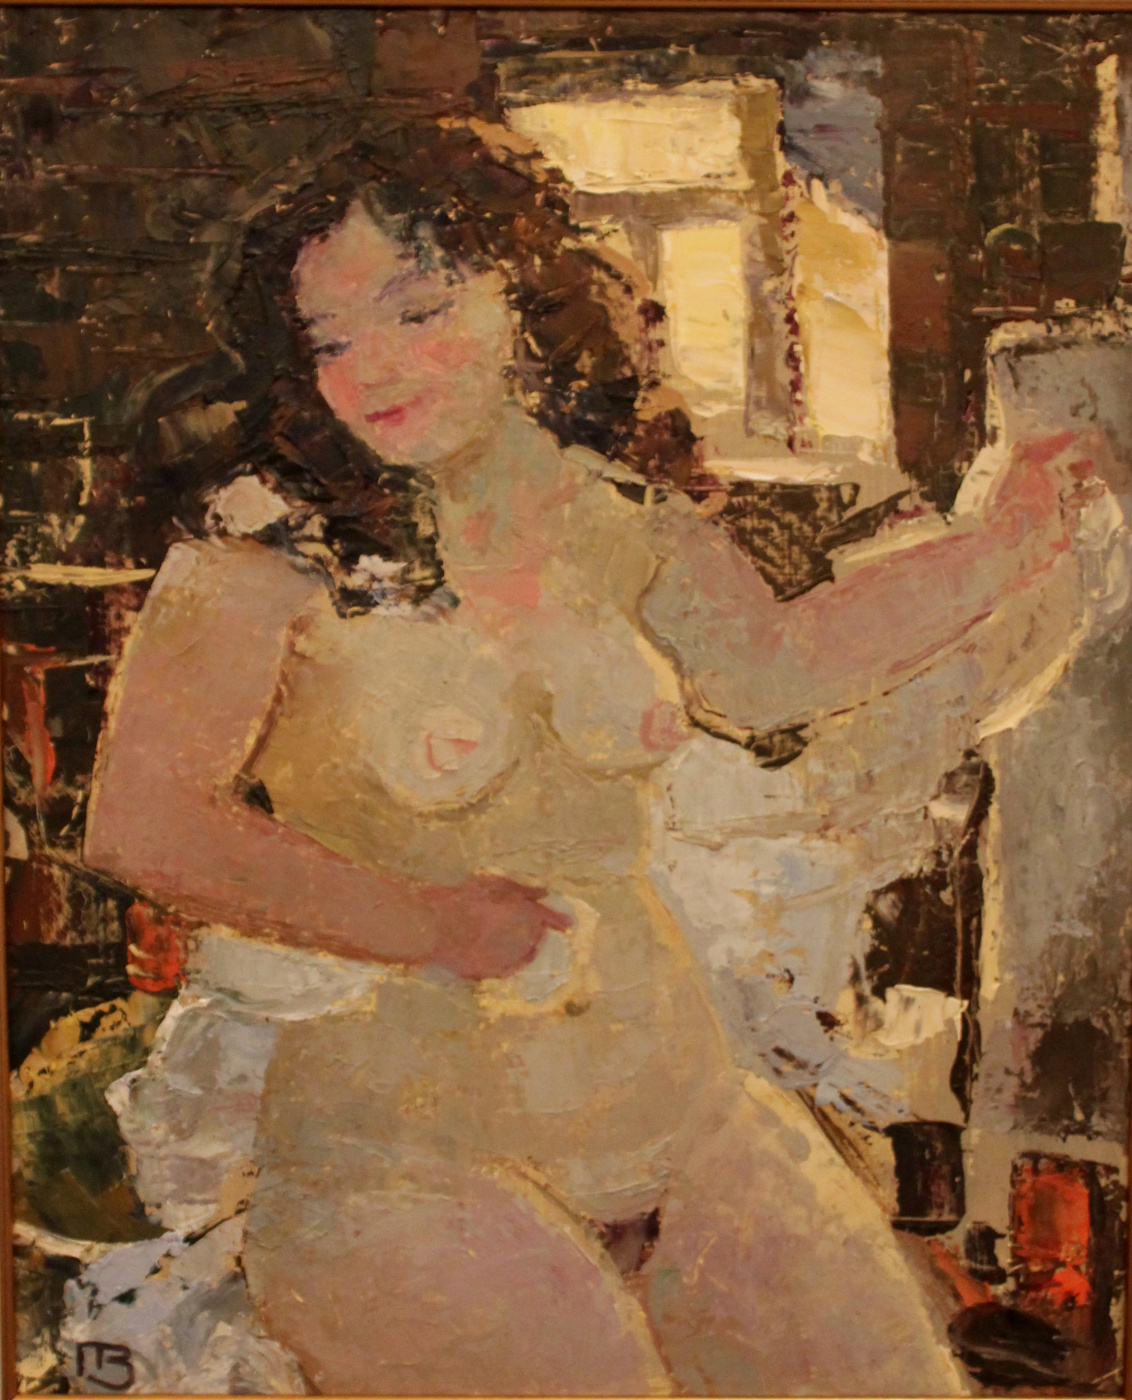 Valery Yurevich Pustoshkin. In the bathhouse